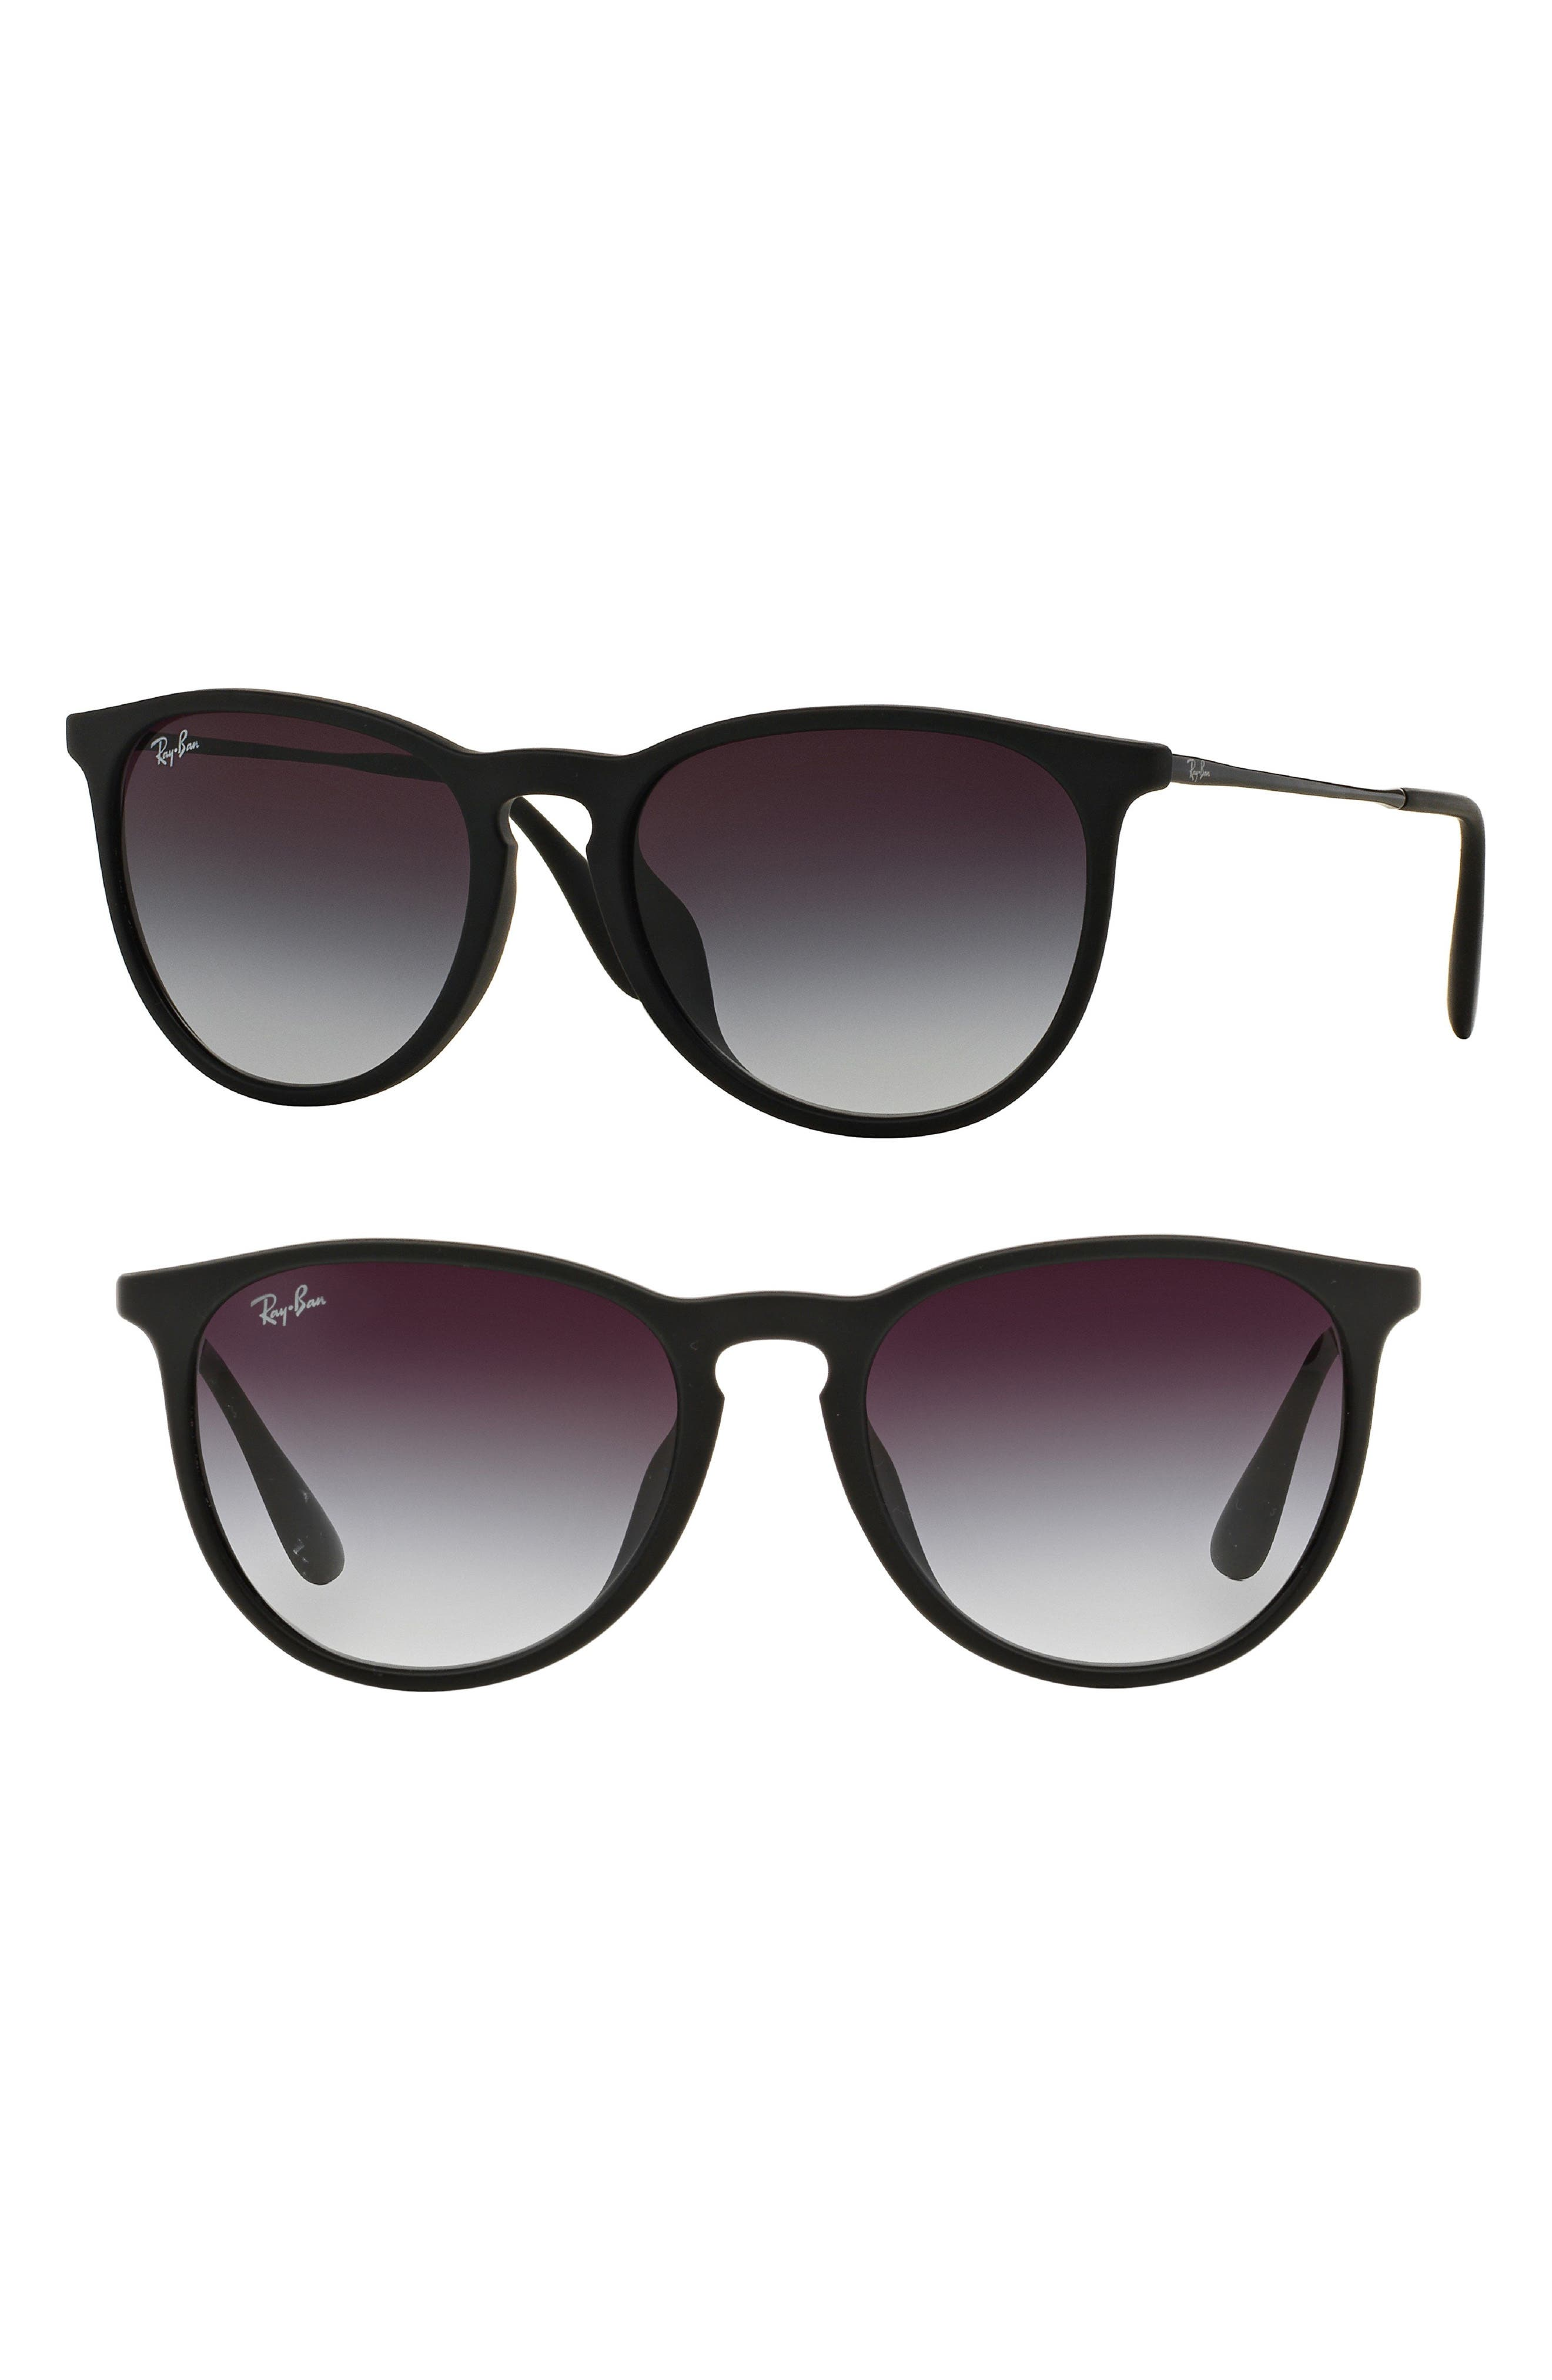 Erika Classic 57mm Sunglasses,                             Main thumbnail 1, color,                             Matte Black